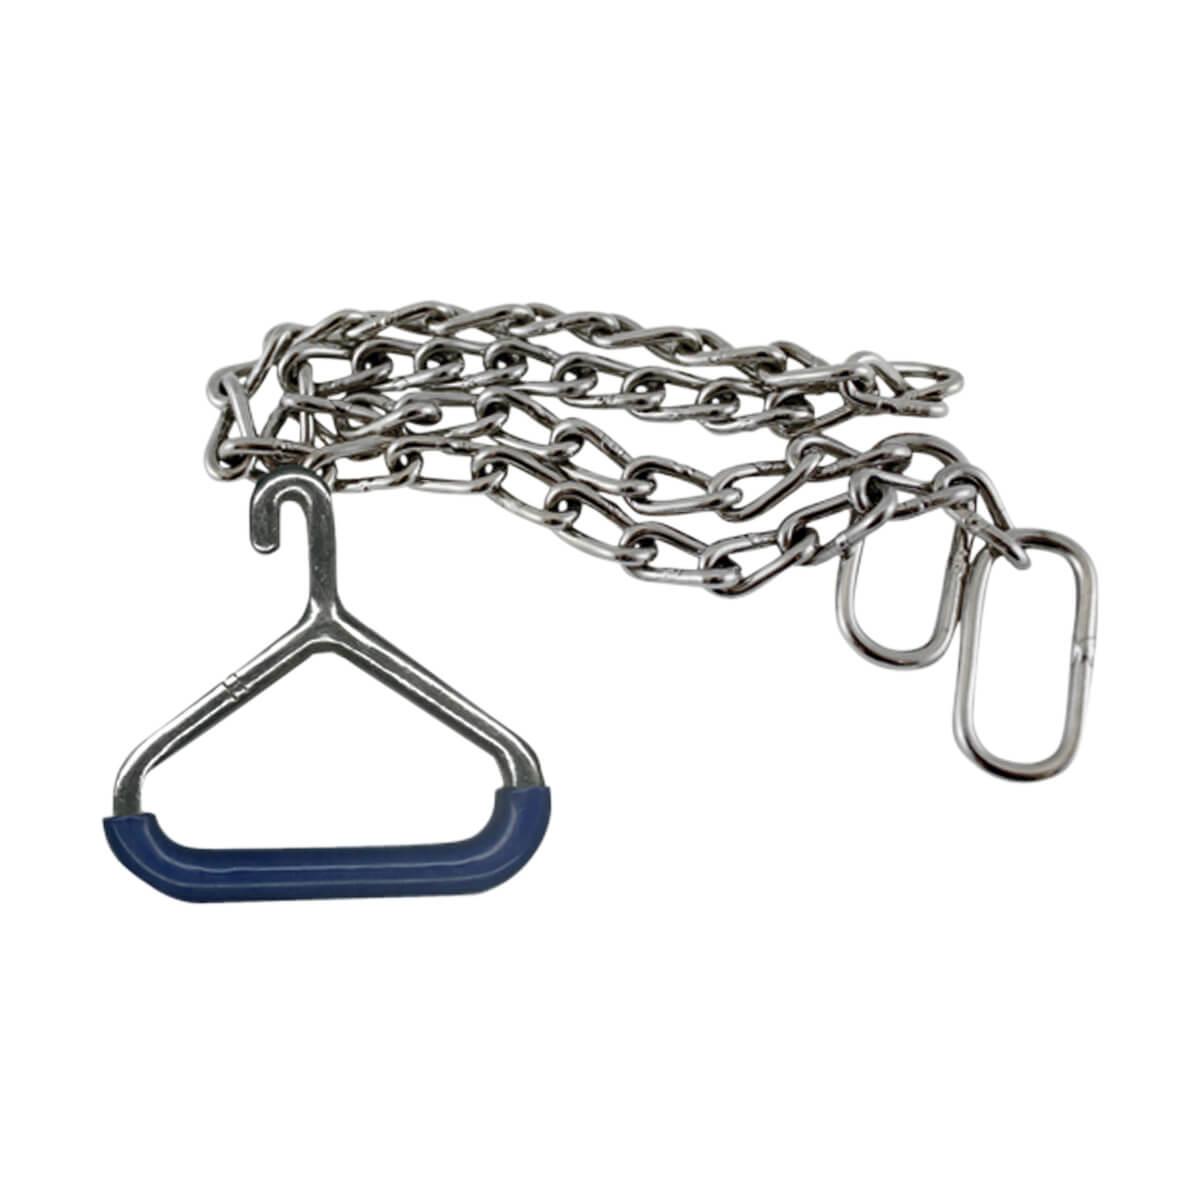 "OB Chain Handle with Chain - 60"""